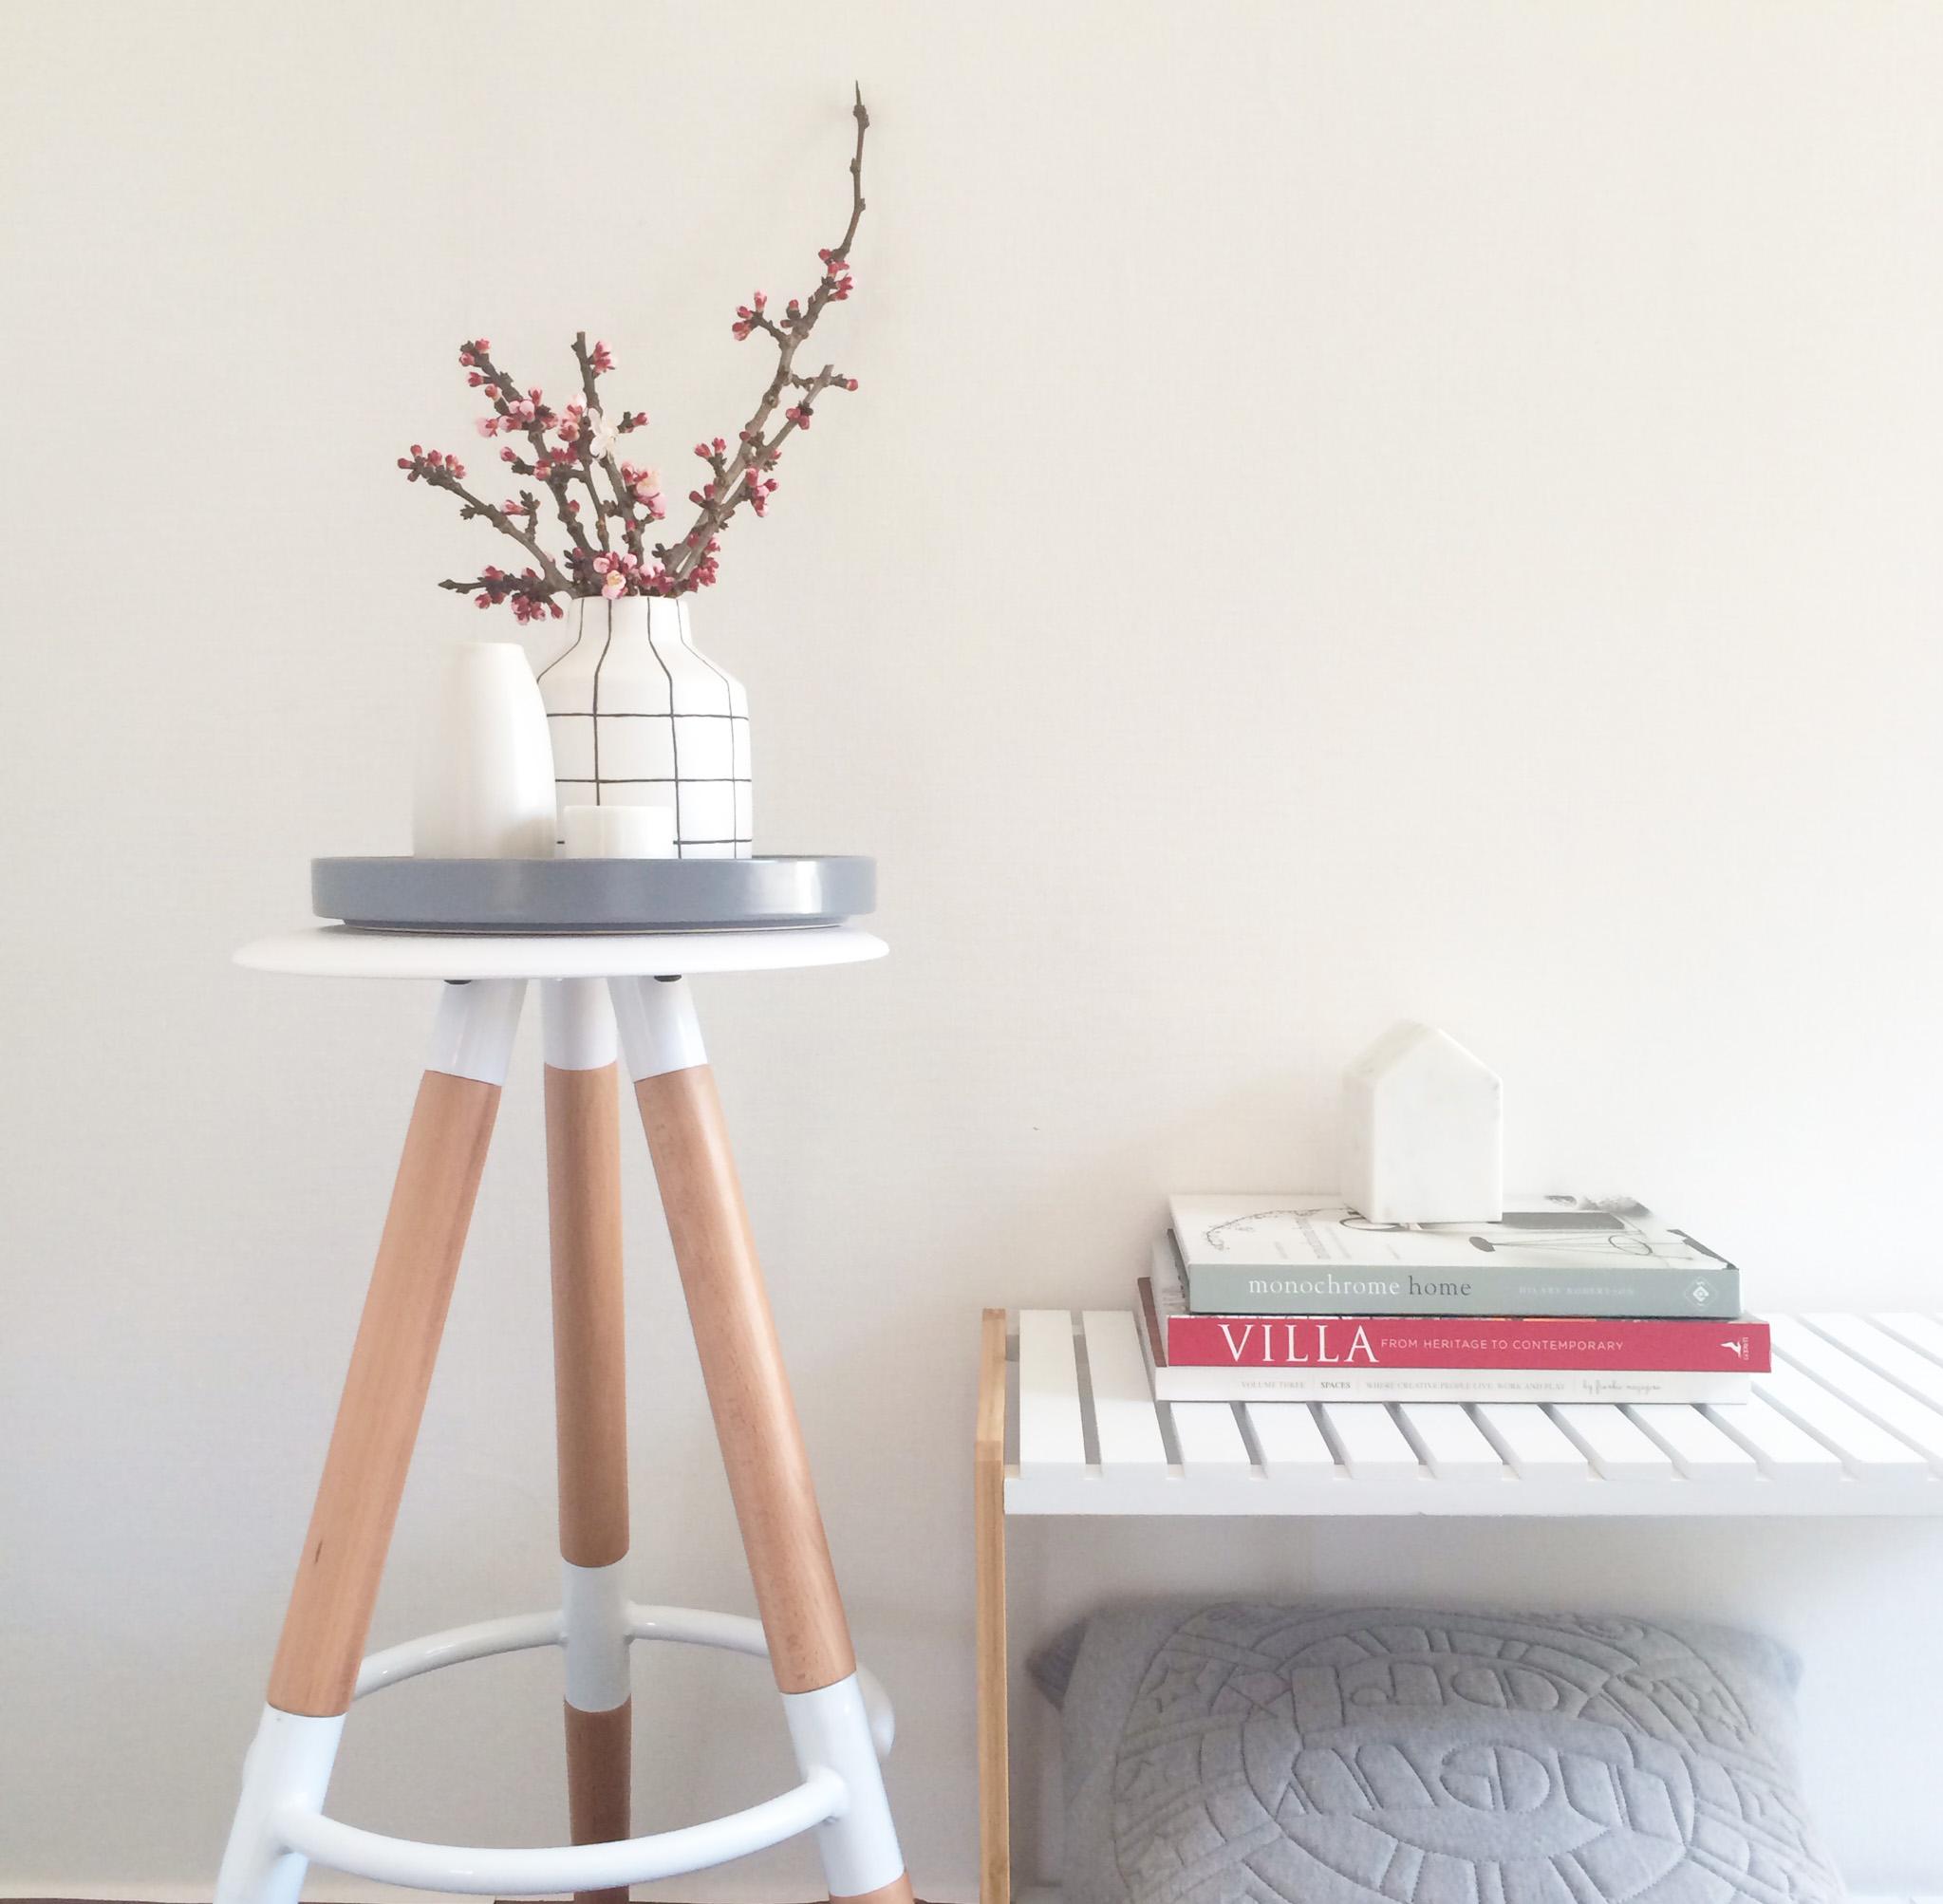 Mocka NZ, Mocka Australia, Mocka Tempo Stools, Stools, Tempo stools, kitchen stools, style your stools